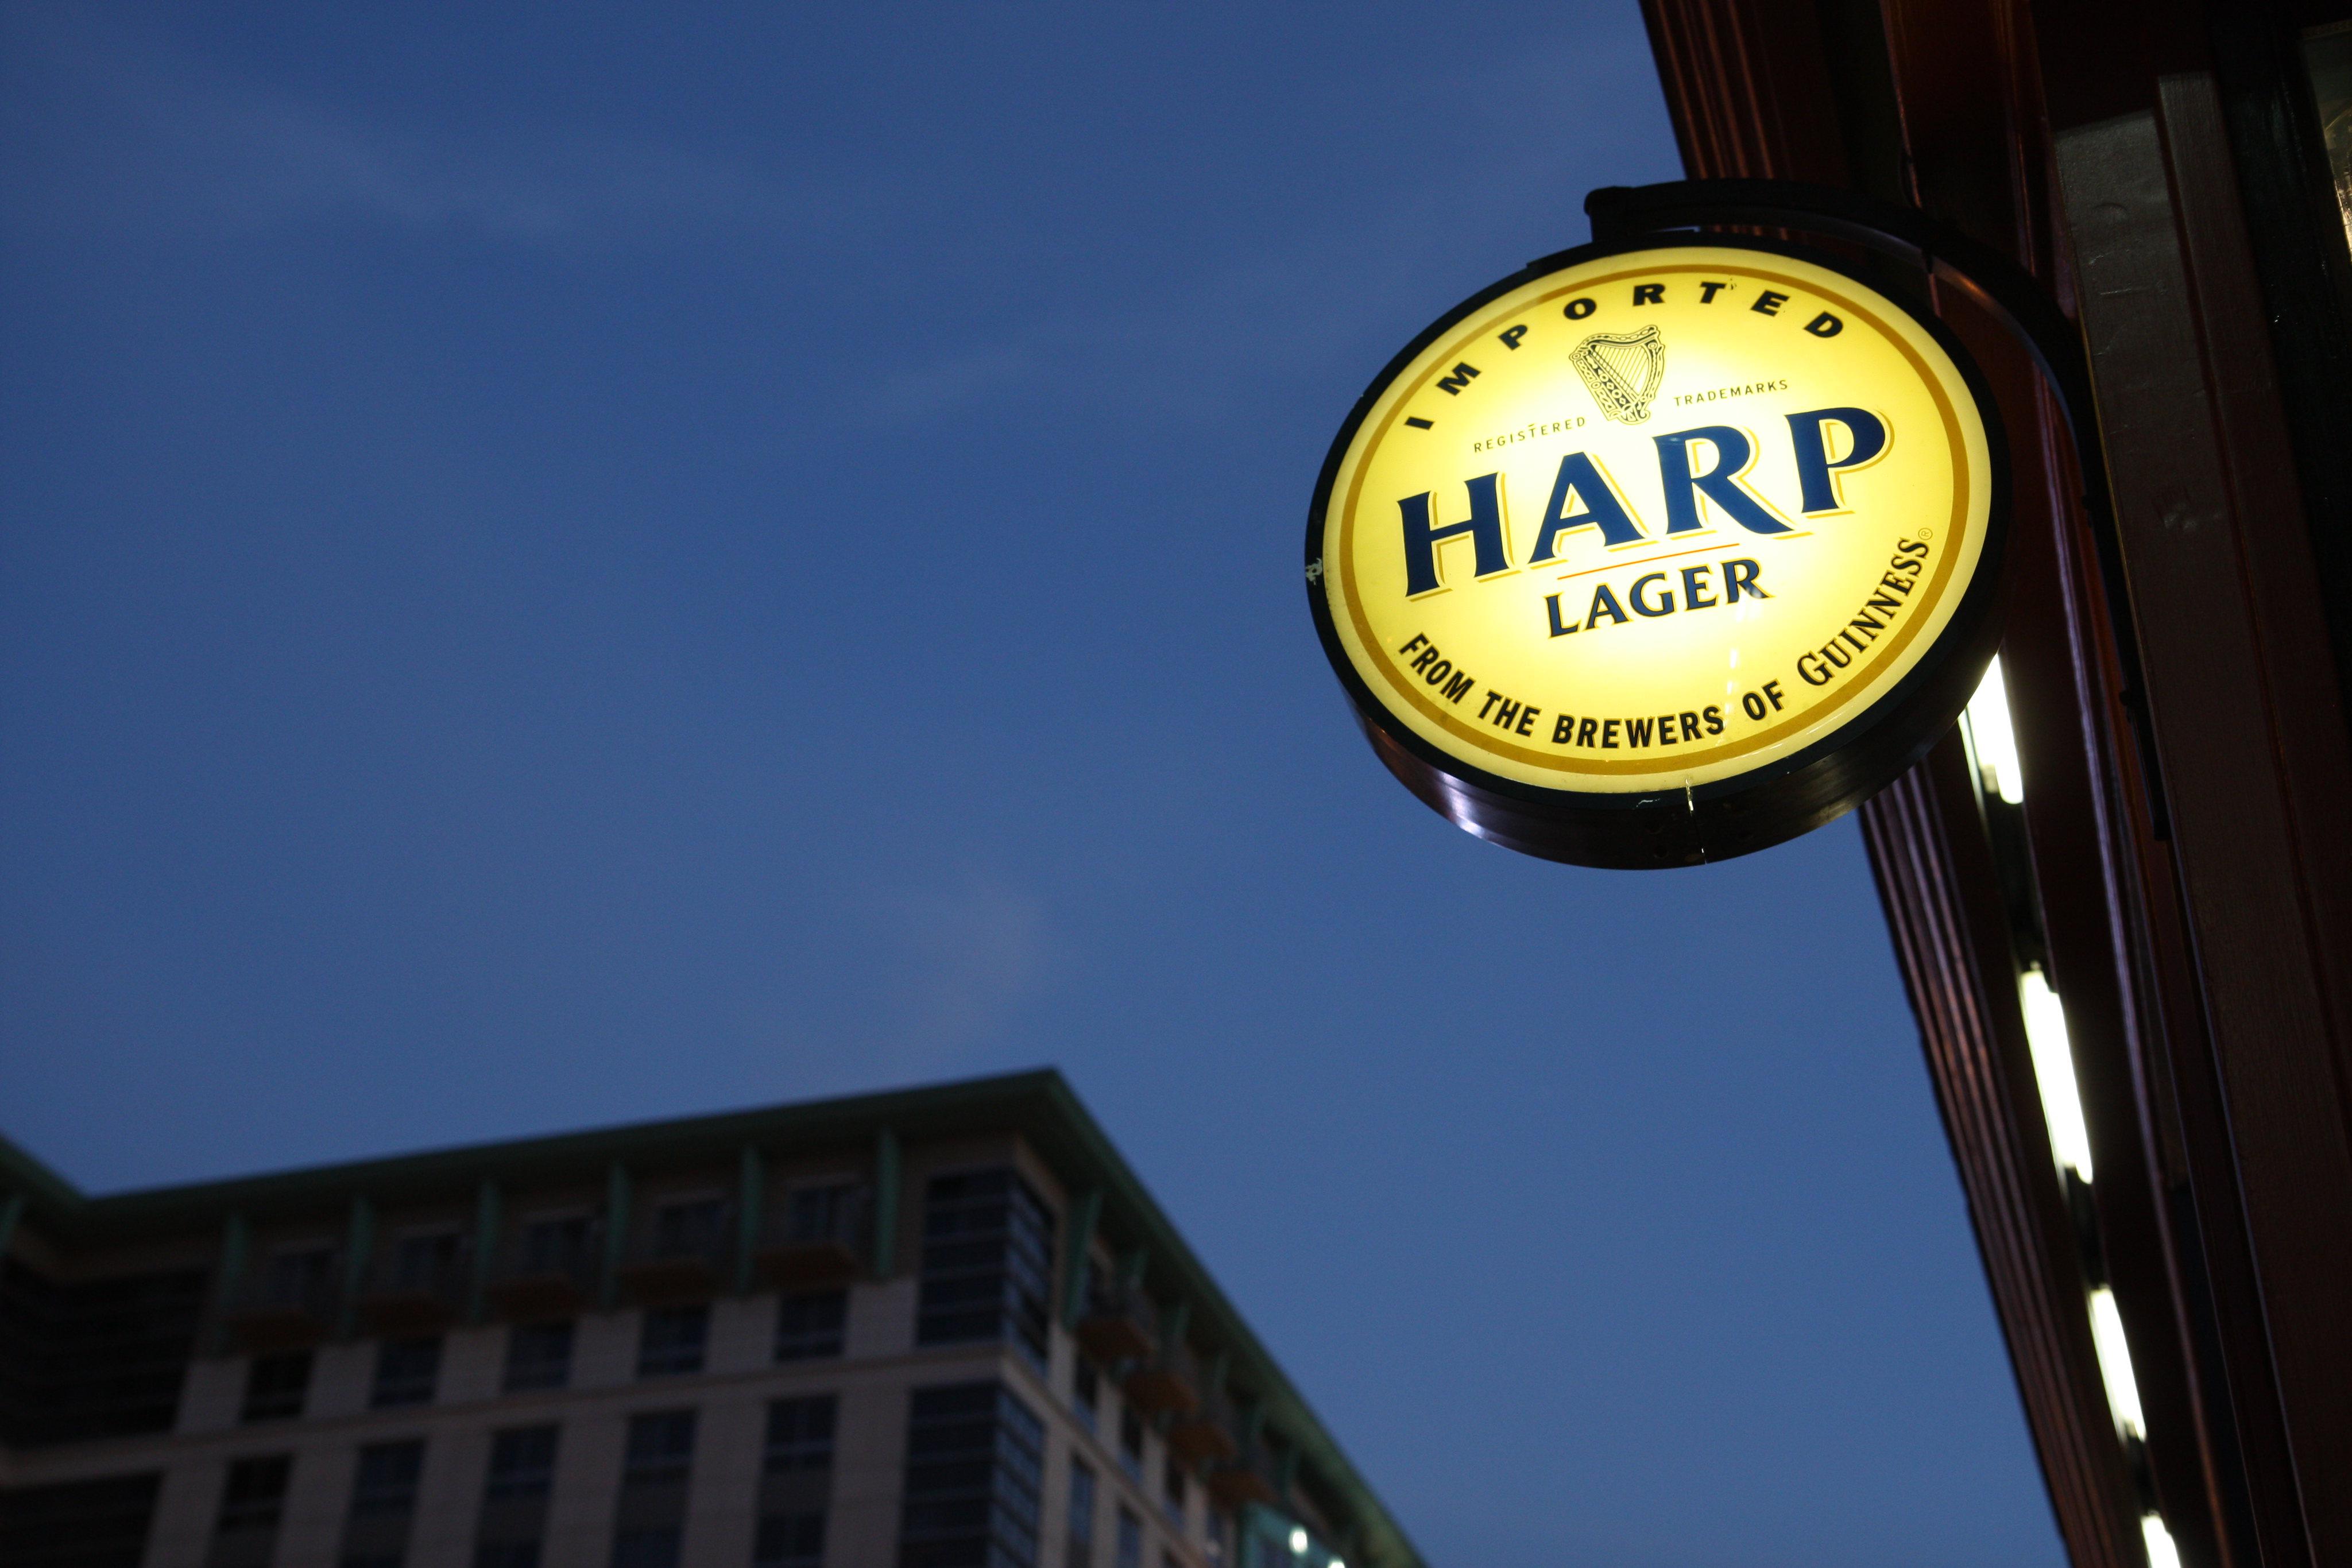 Harp Lager Sign